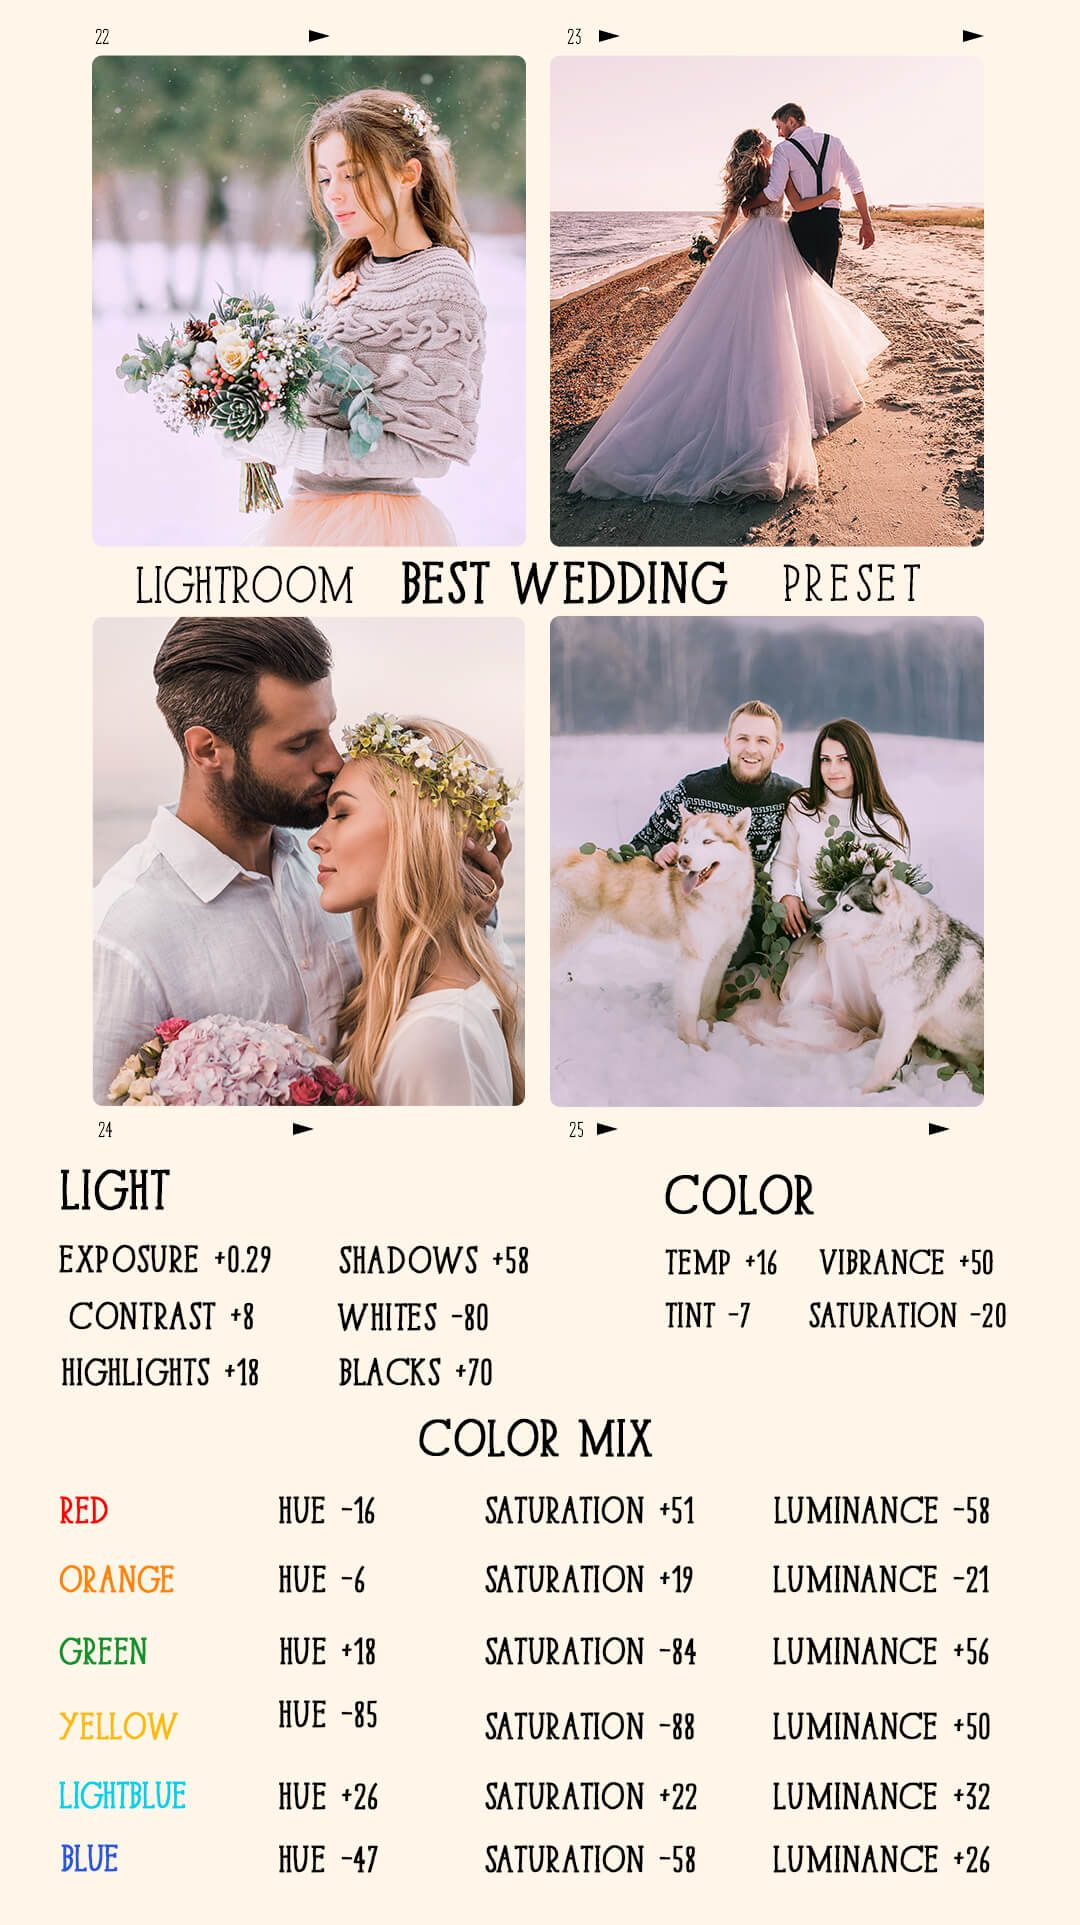 Adobe Lightroom Presets Free Wedding Classic Tone Wedding Presets Adobe Lightroom Photo Editing Lightroom Presets Wedding